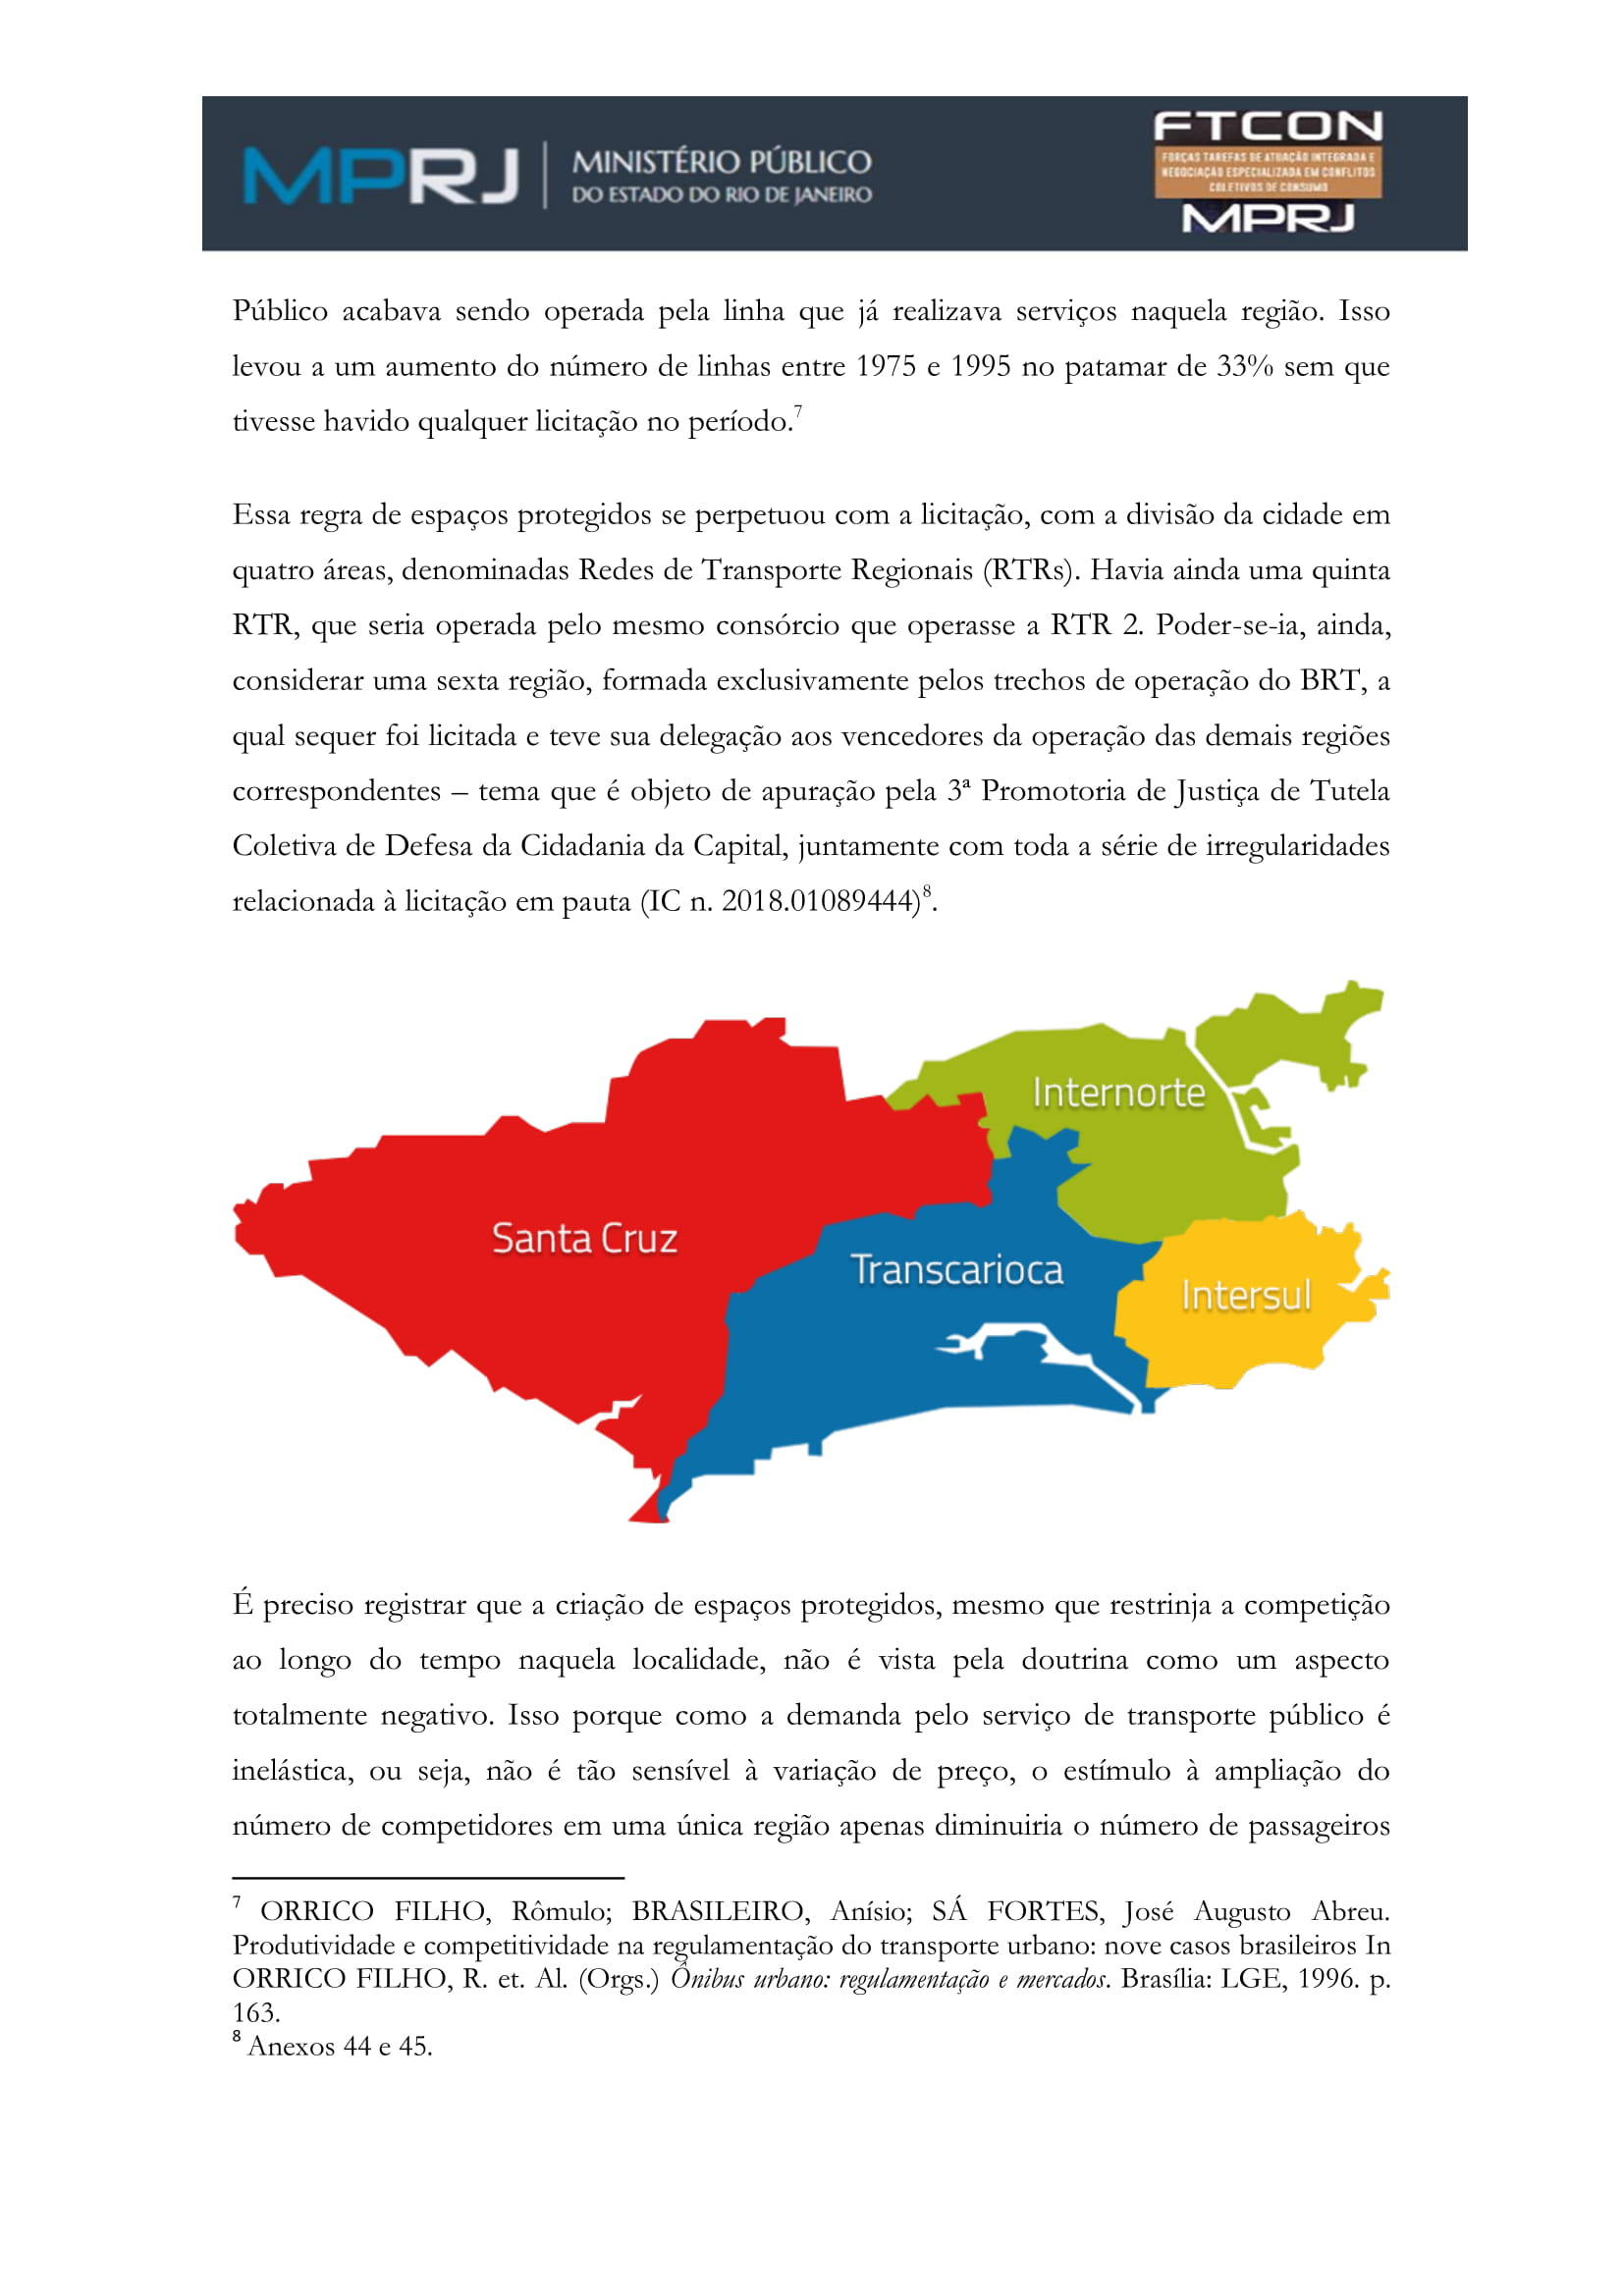 acp_caducidade_onibus_dr_rt-011